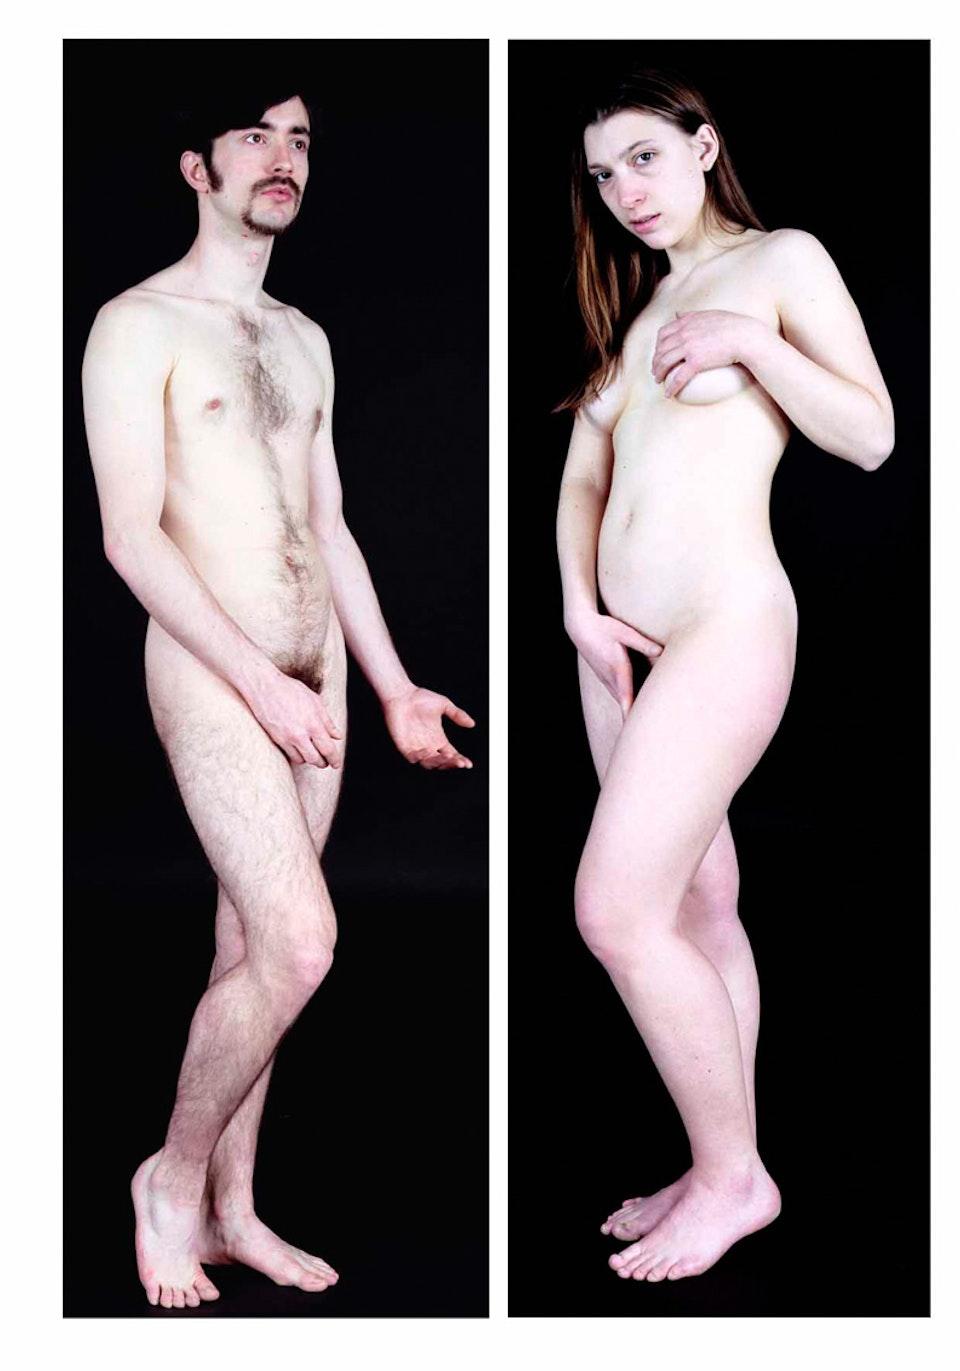 Archétype - Adam et Eve, 2004 (150x75cm)